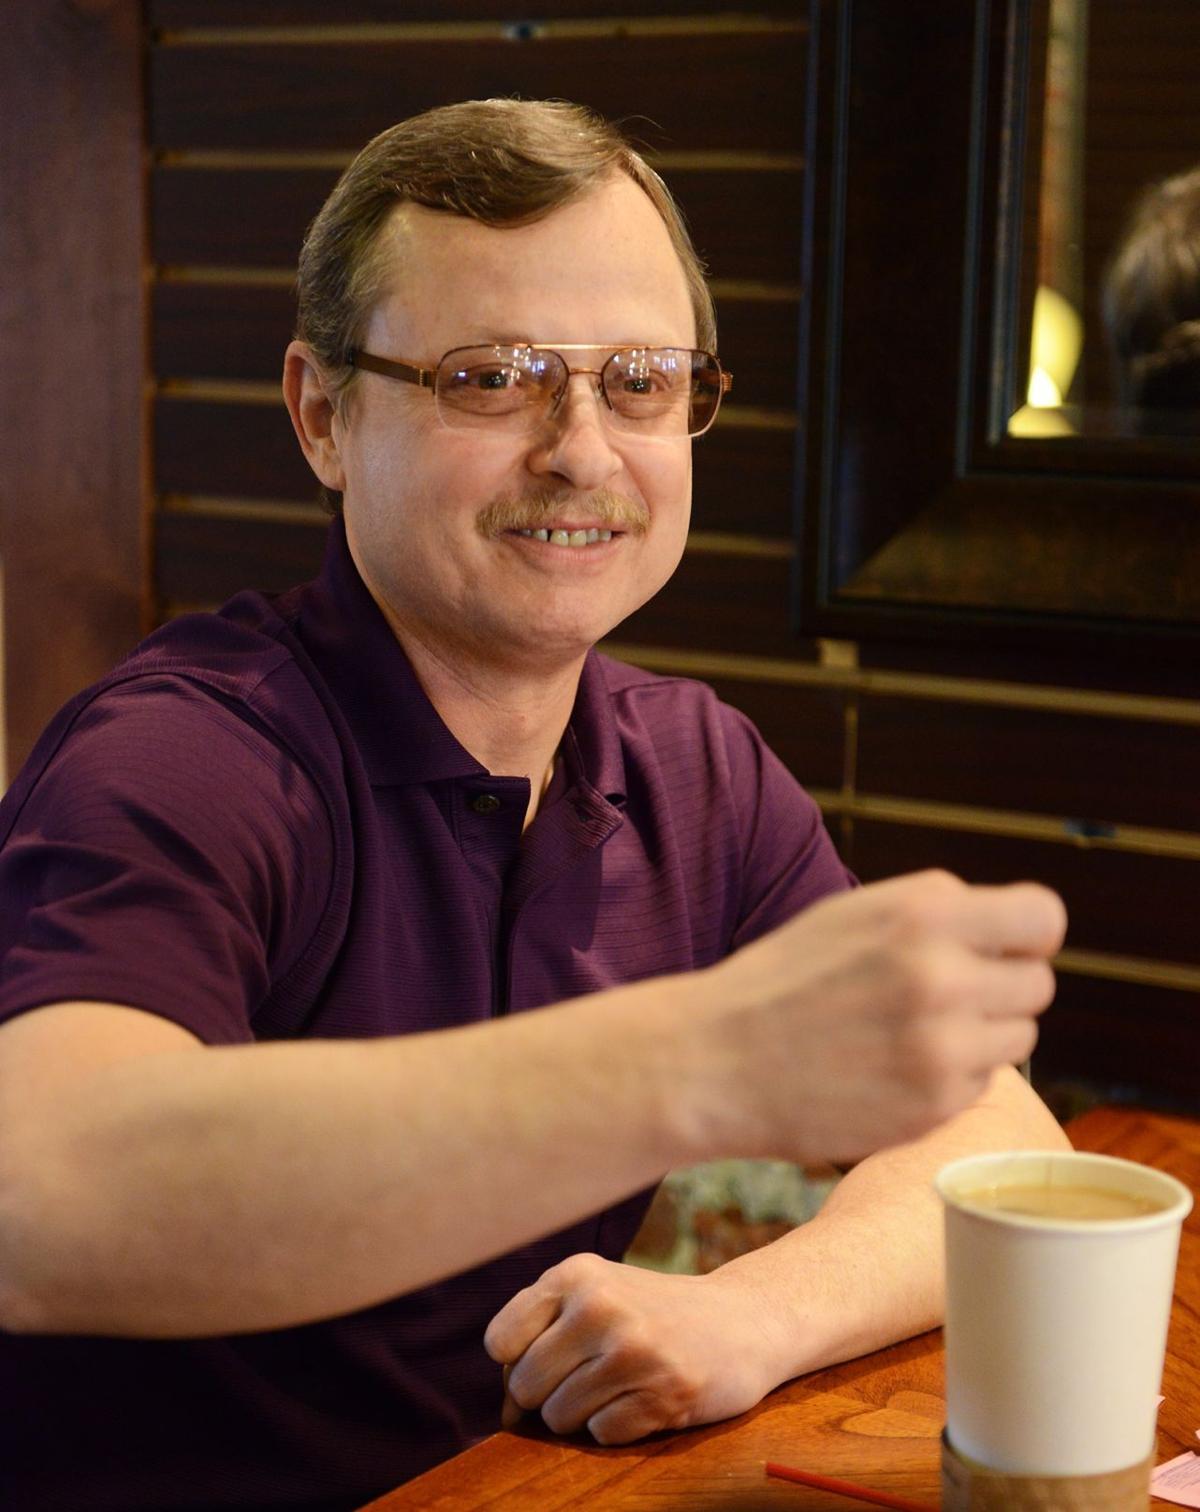 Spotlight success: Former patient now helps mentally ill